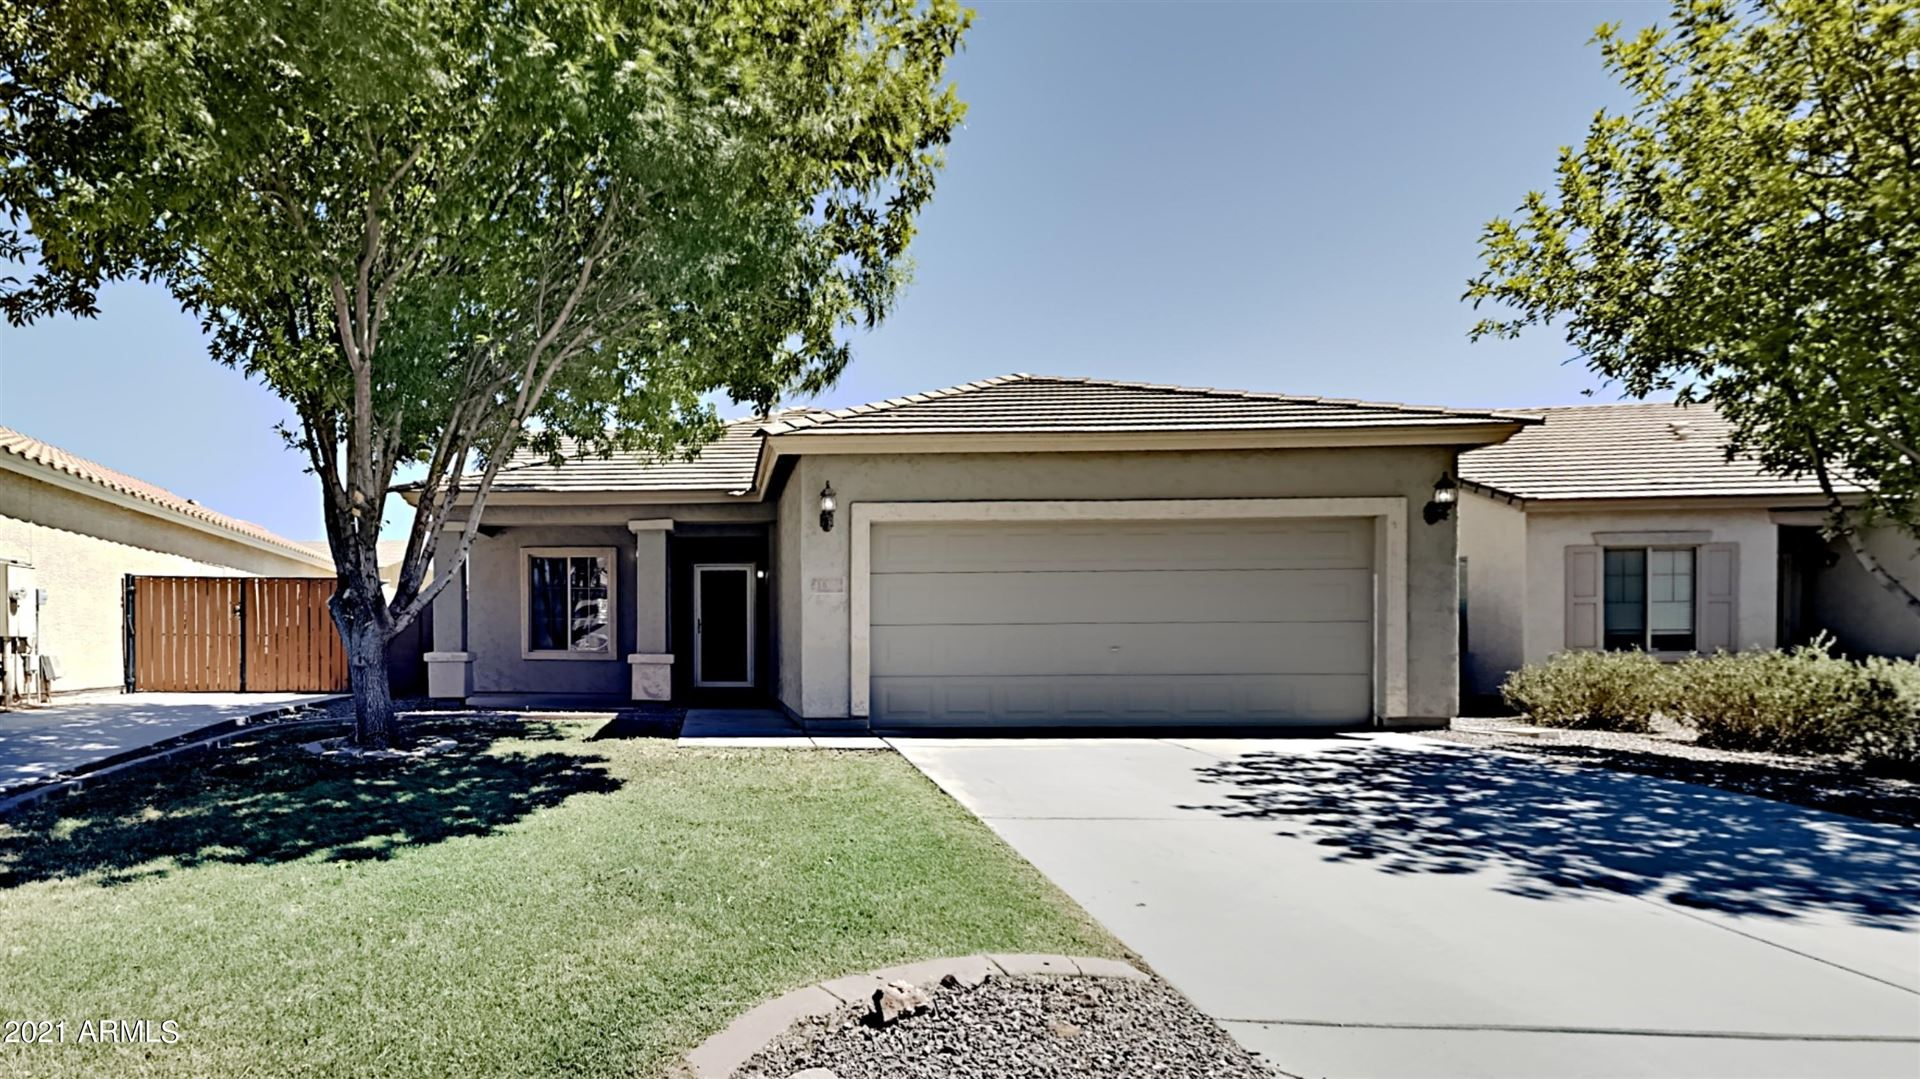 41303 N PALM SPRINGS Trail, San Tan Valley, AZ 85140 - MLS#: 6250623